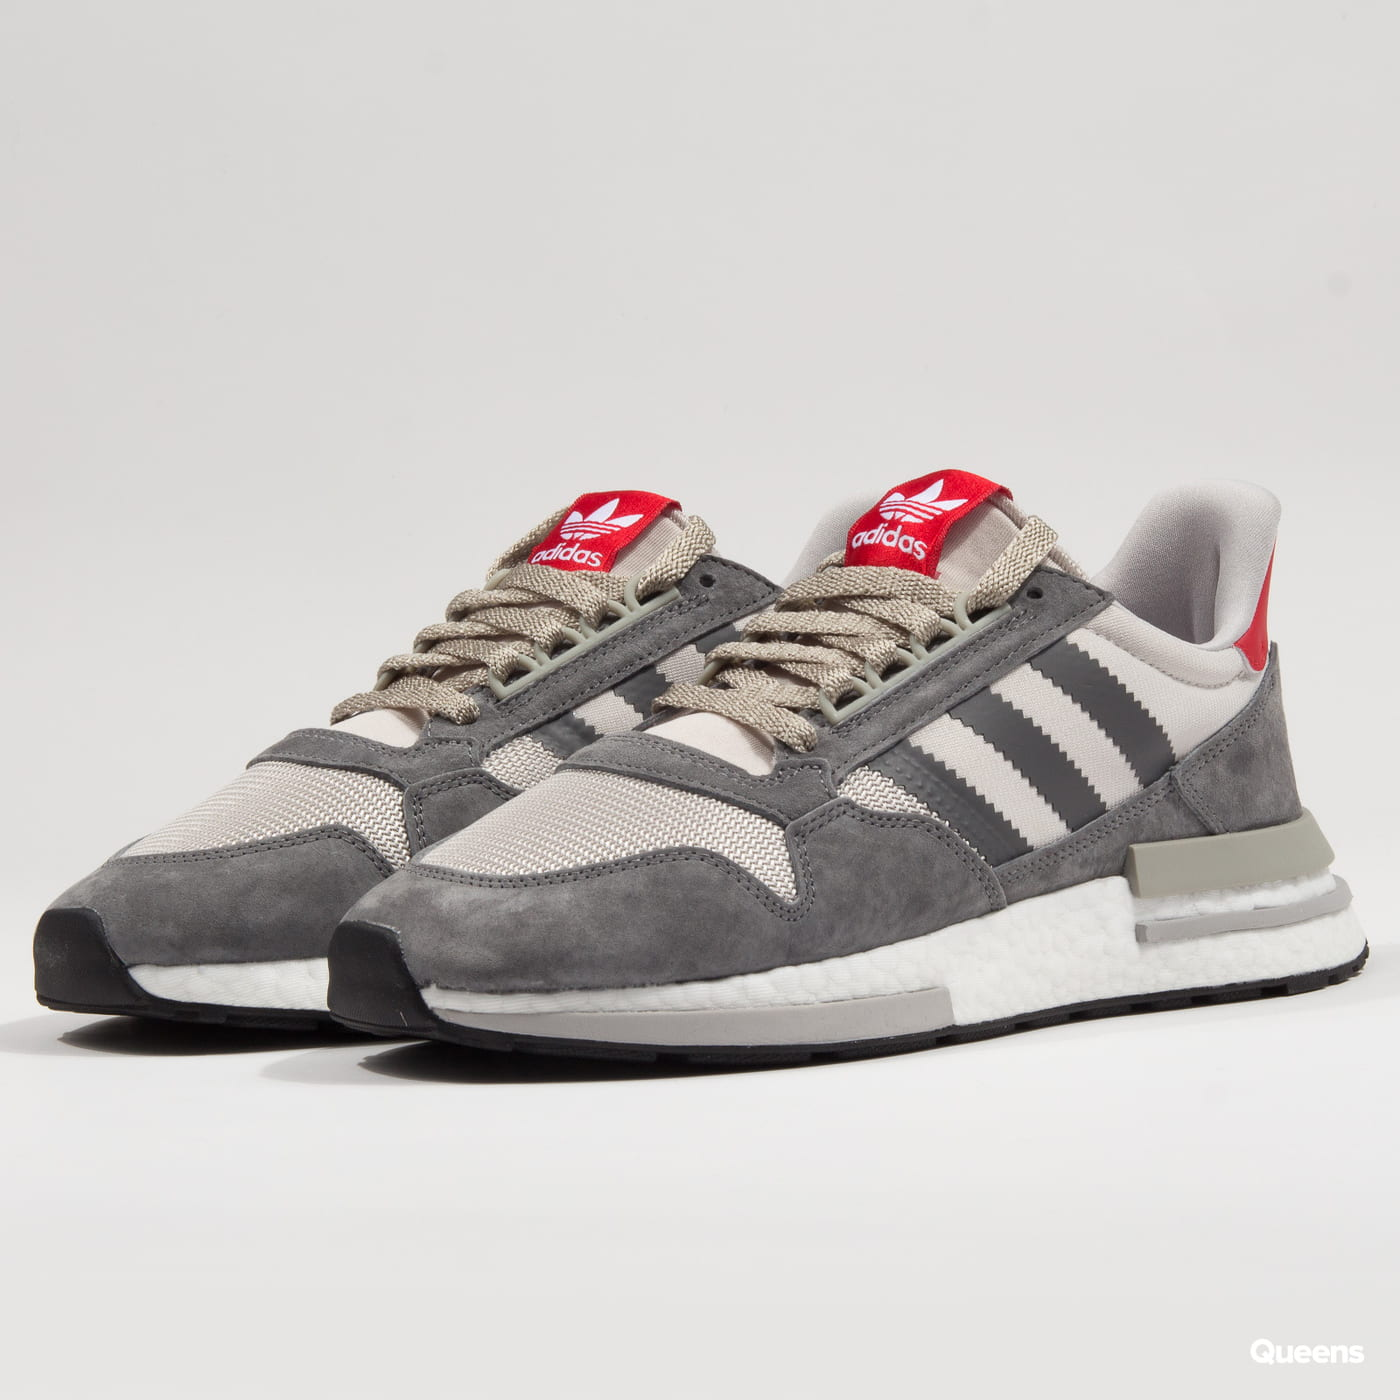 Sneakers adidas Originals ZX 500 RM